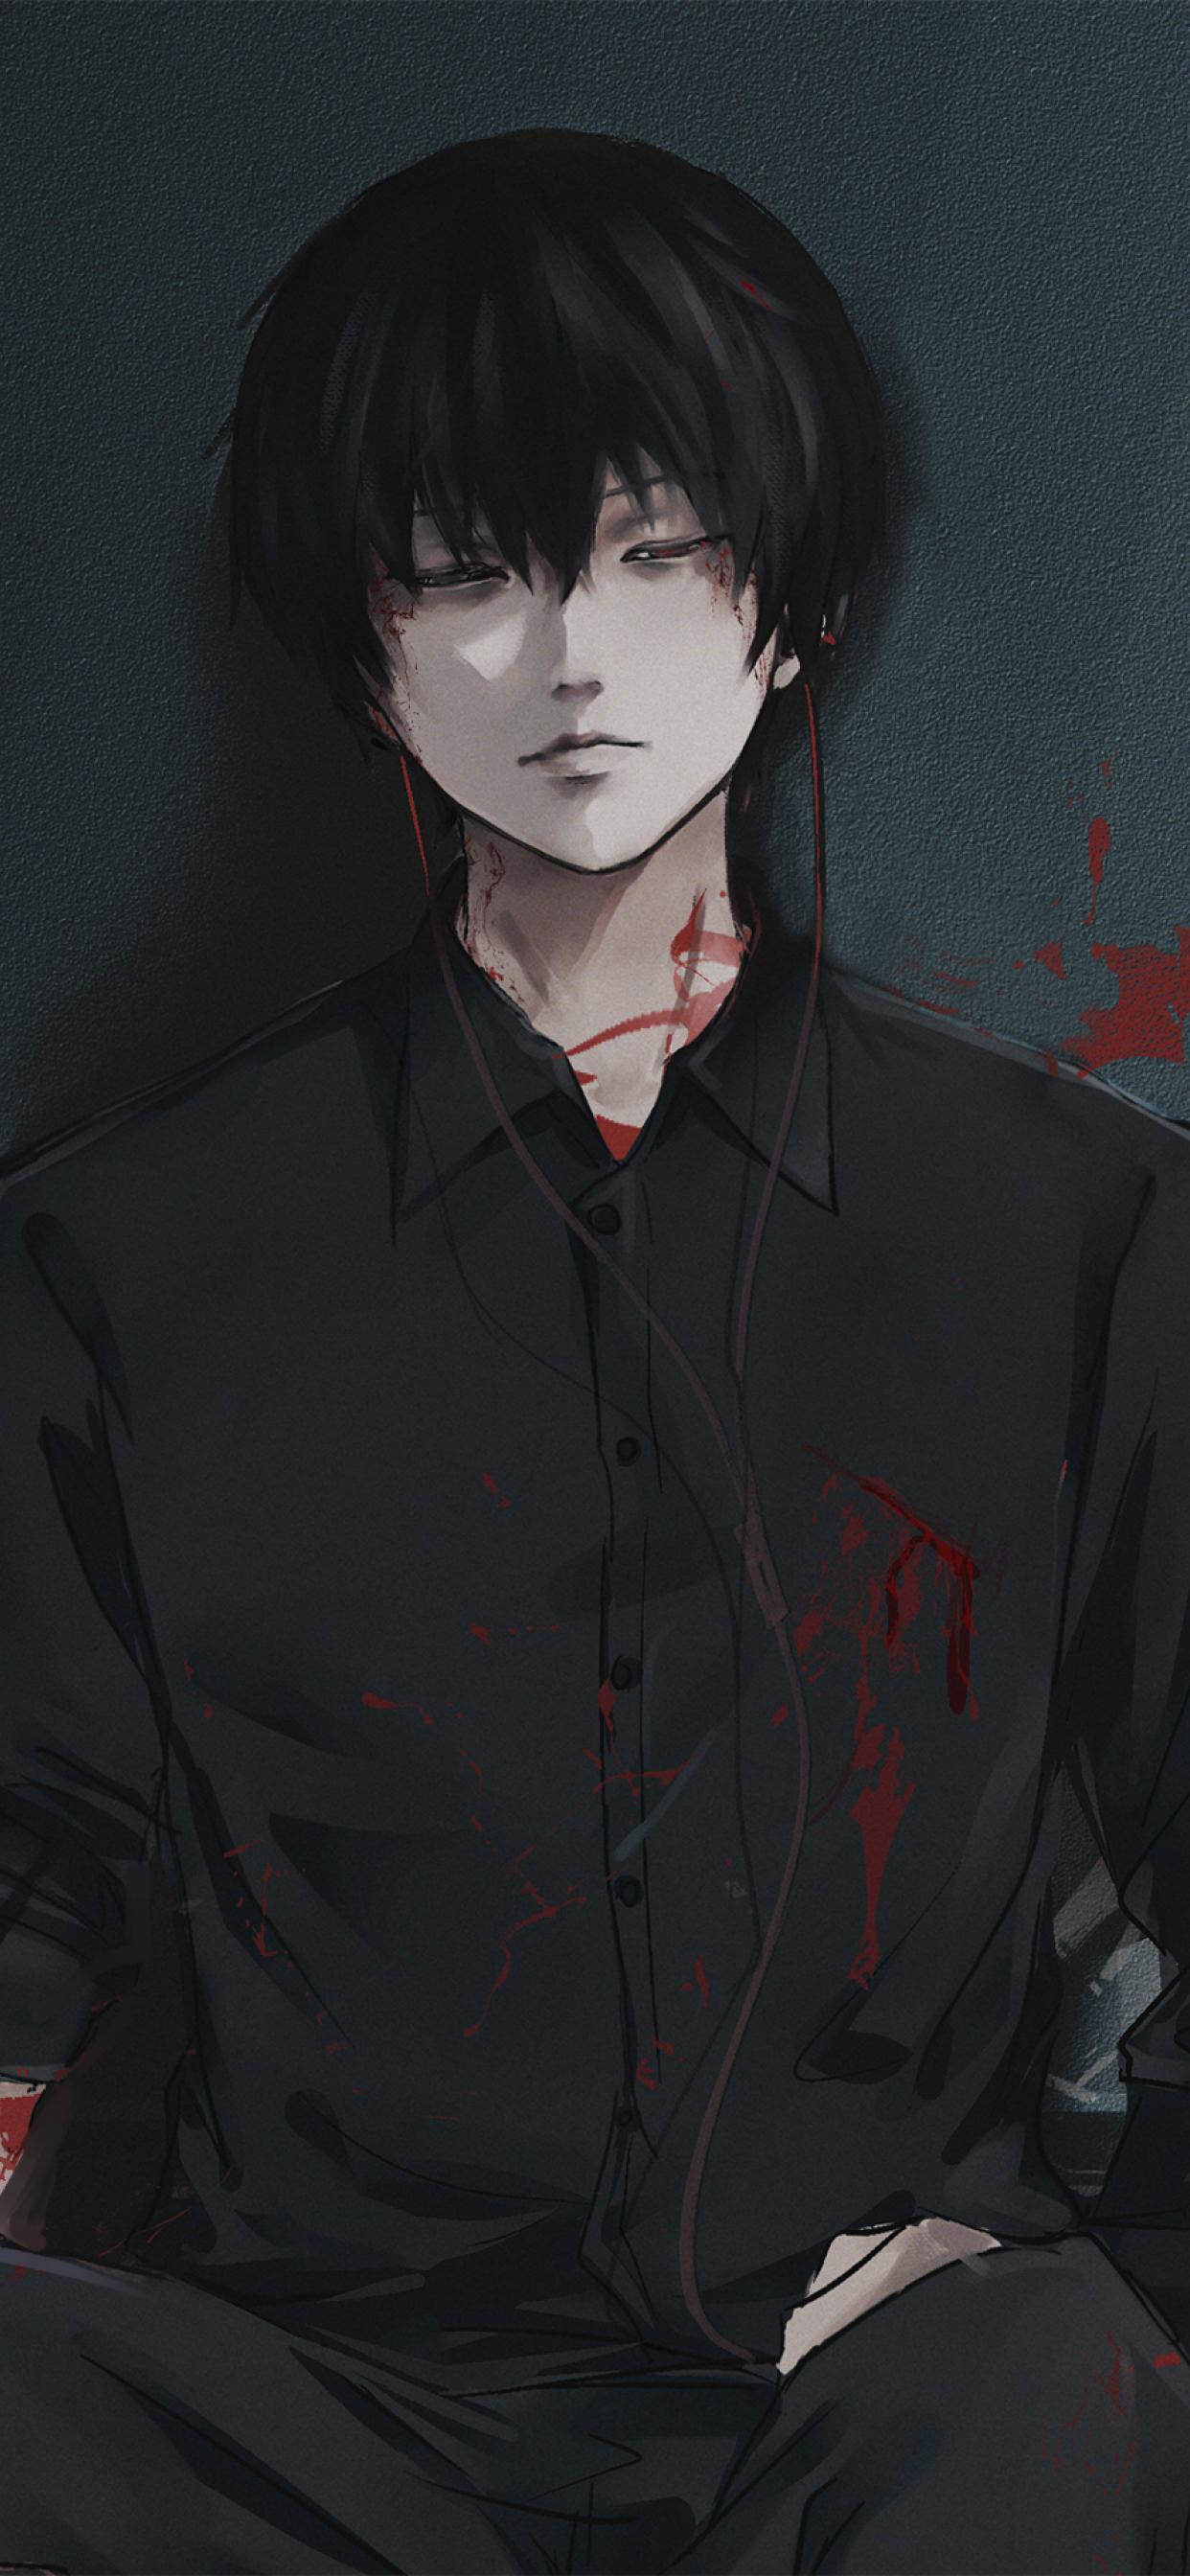 Ken Kaneki From Tokyo Ghoul Wallpaper in 1242x2688 Resolution